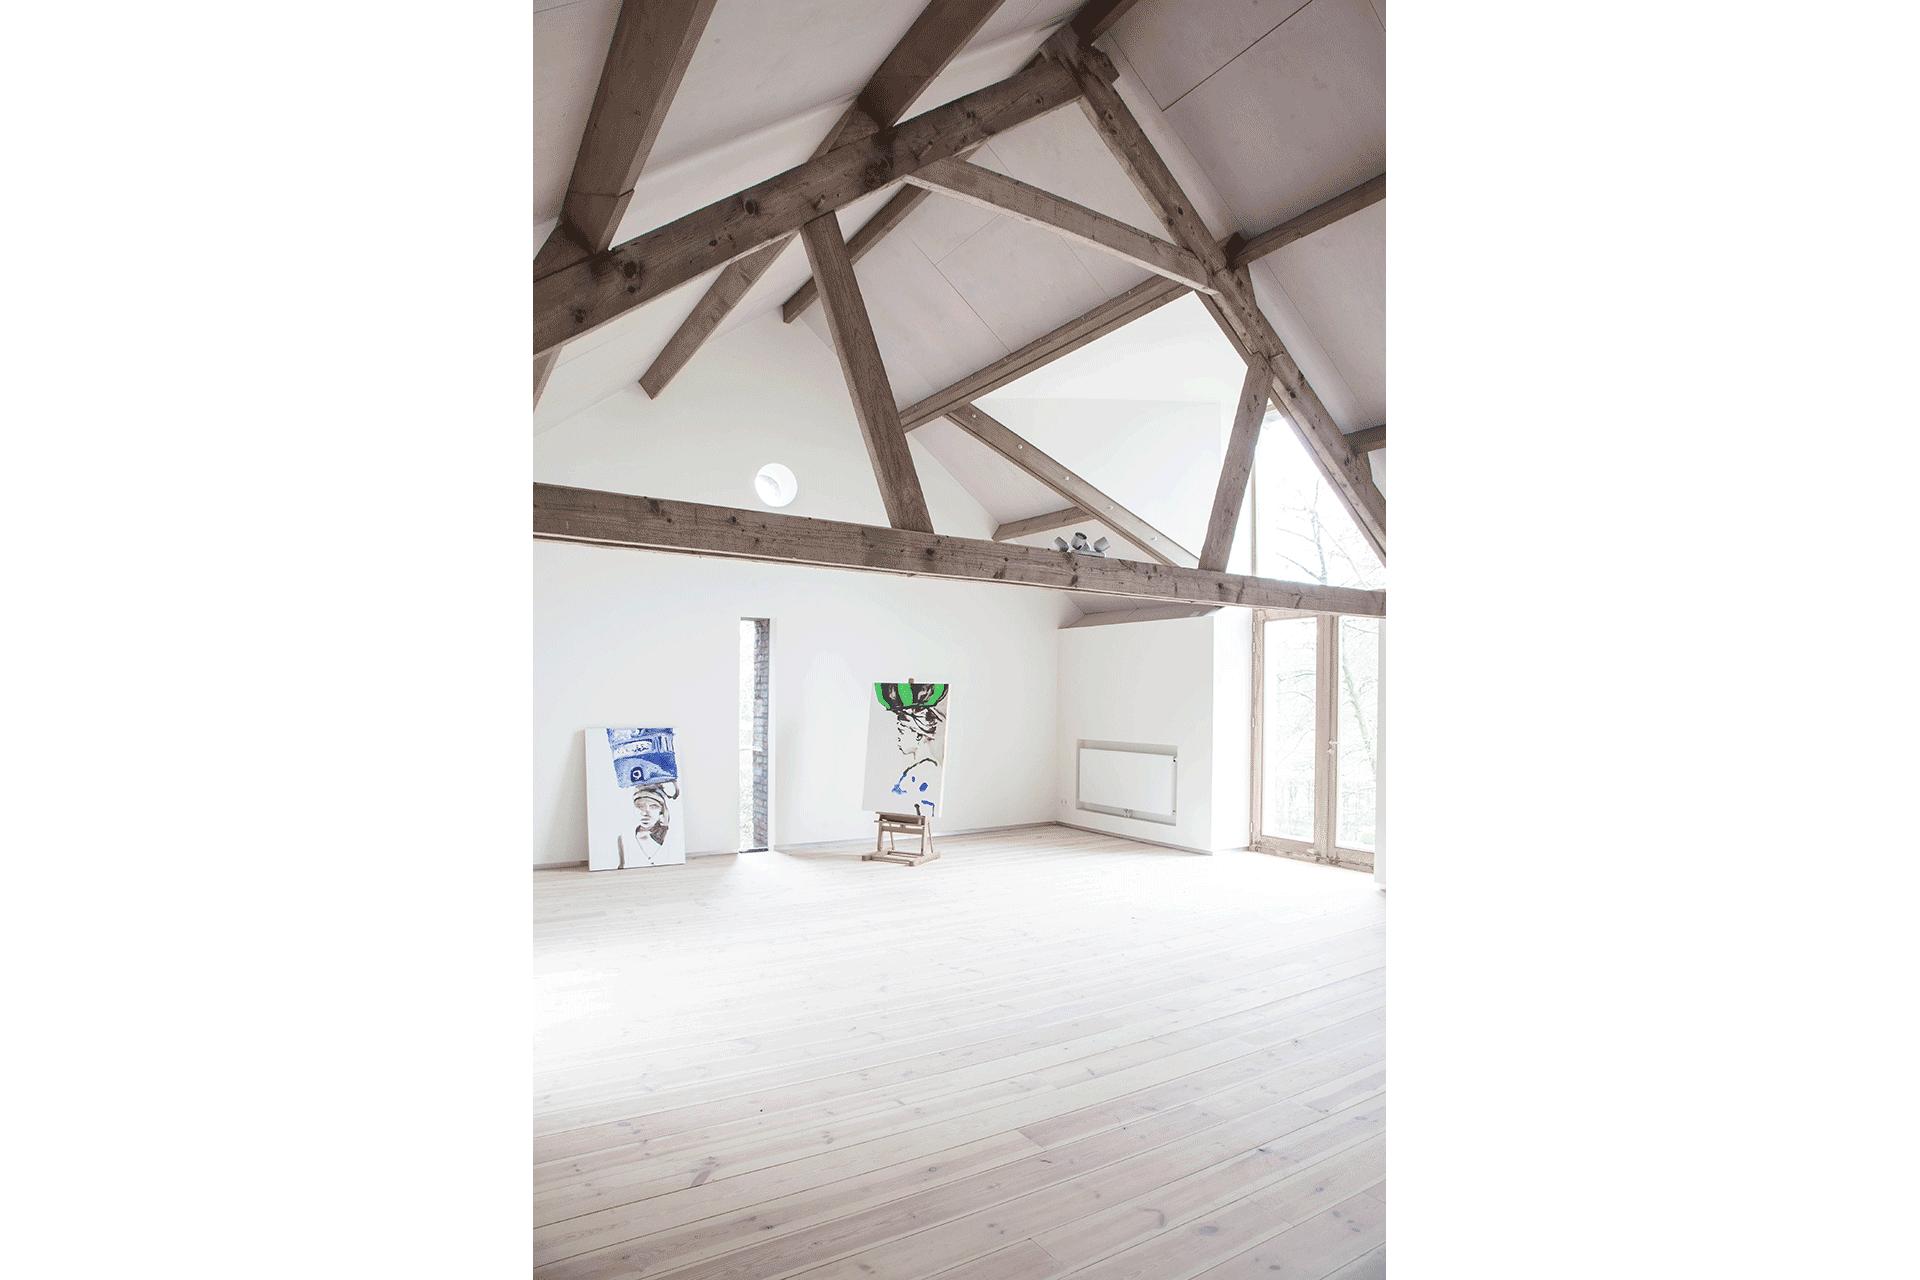 verbouw boederij dakspant dak dakkap zolder hout oud dak constructie